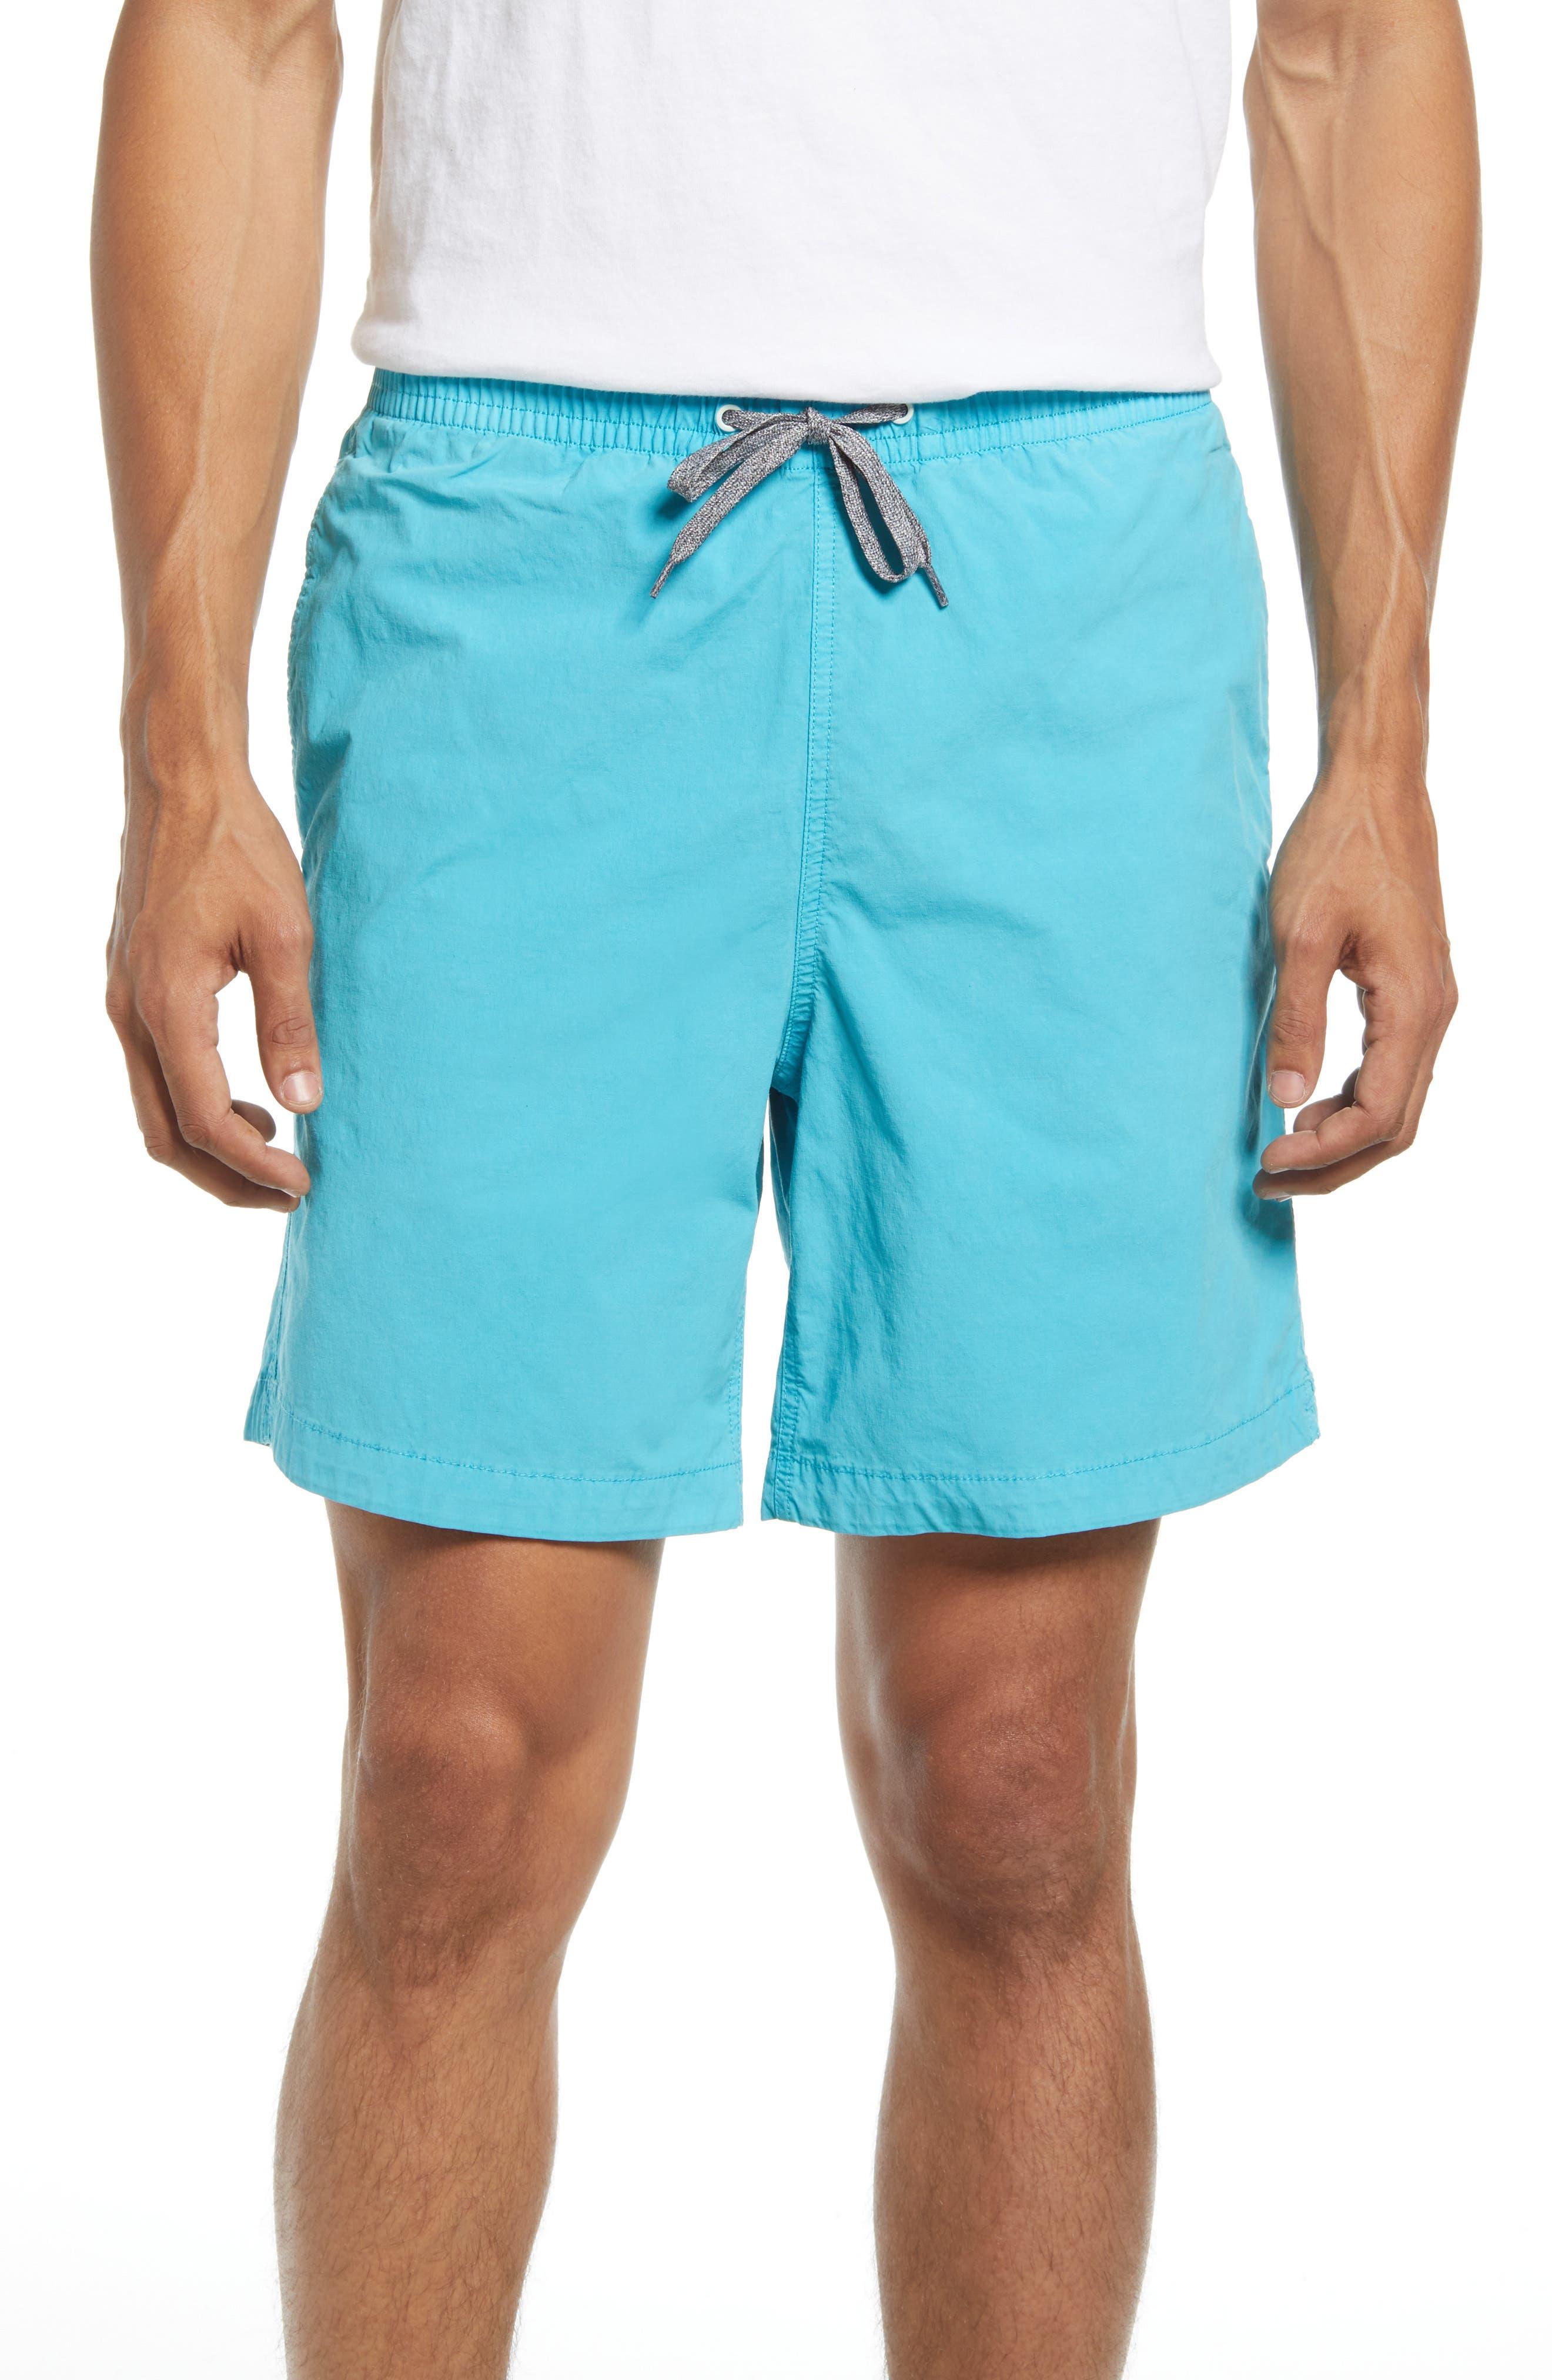 Anywhere Drawstring Shorts